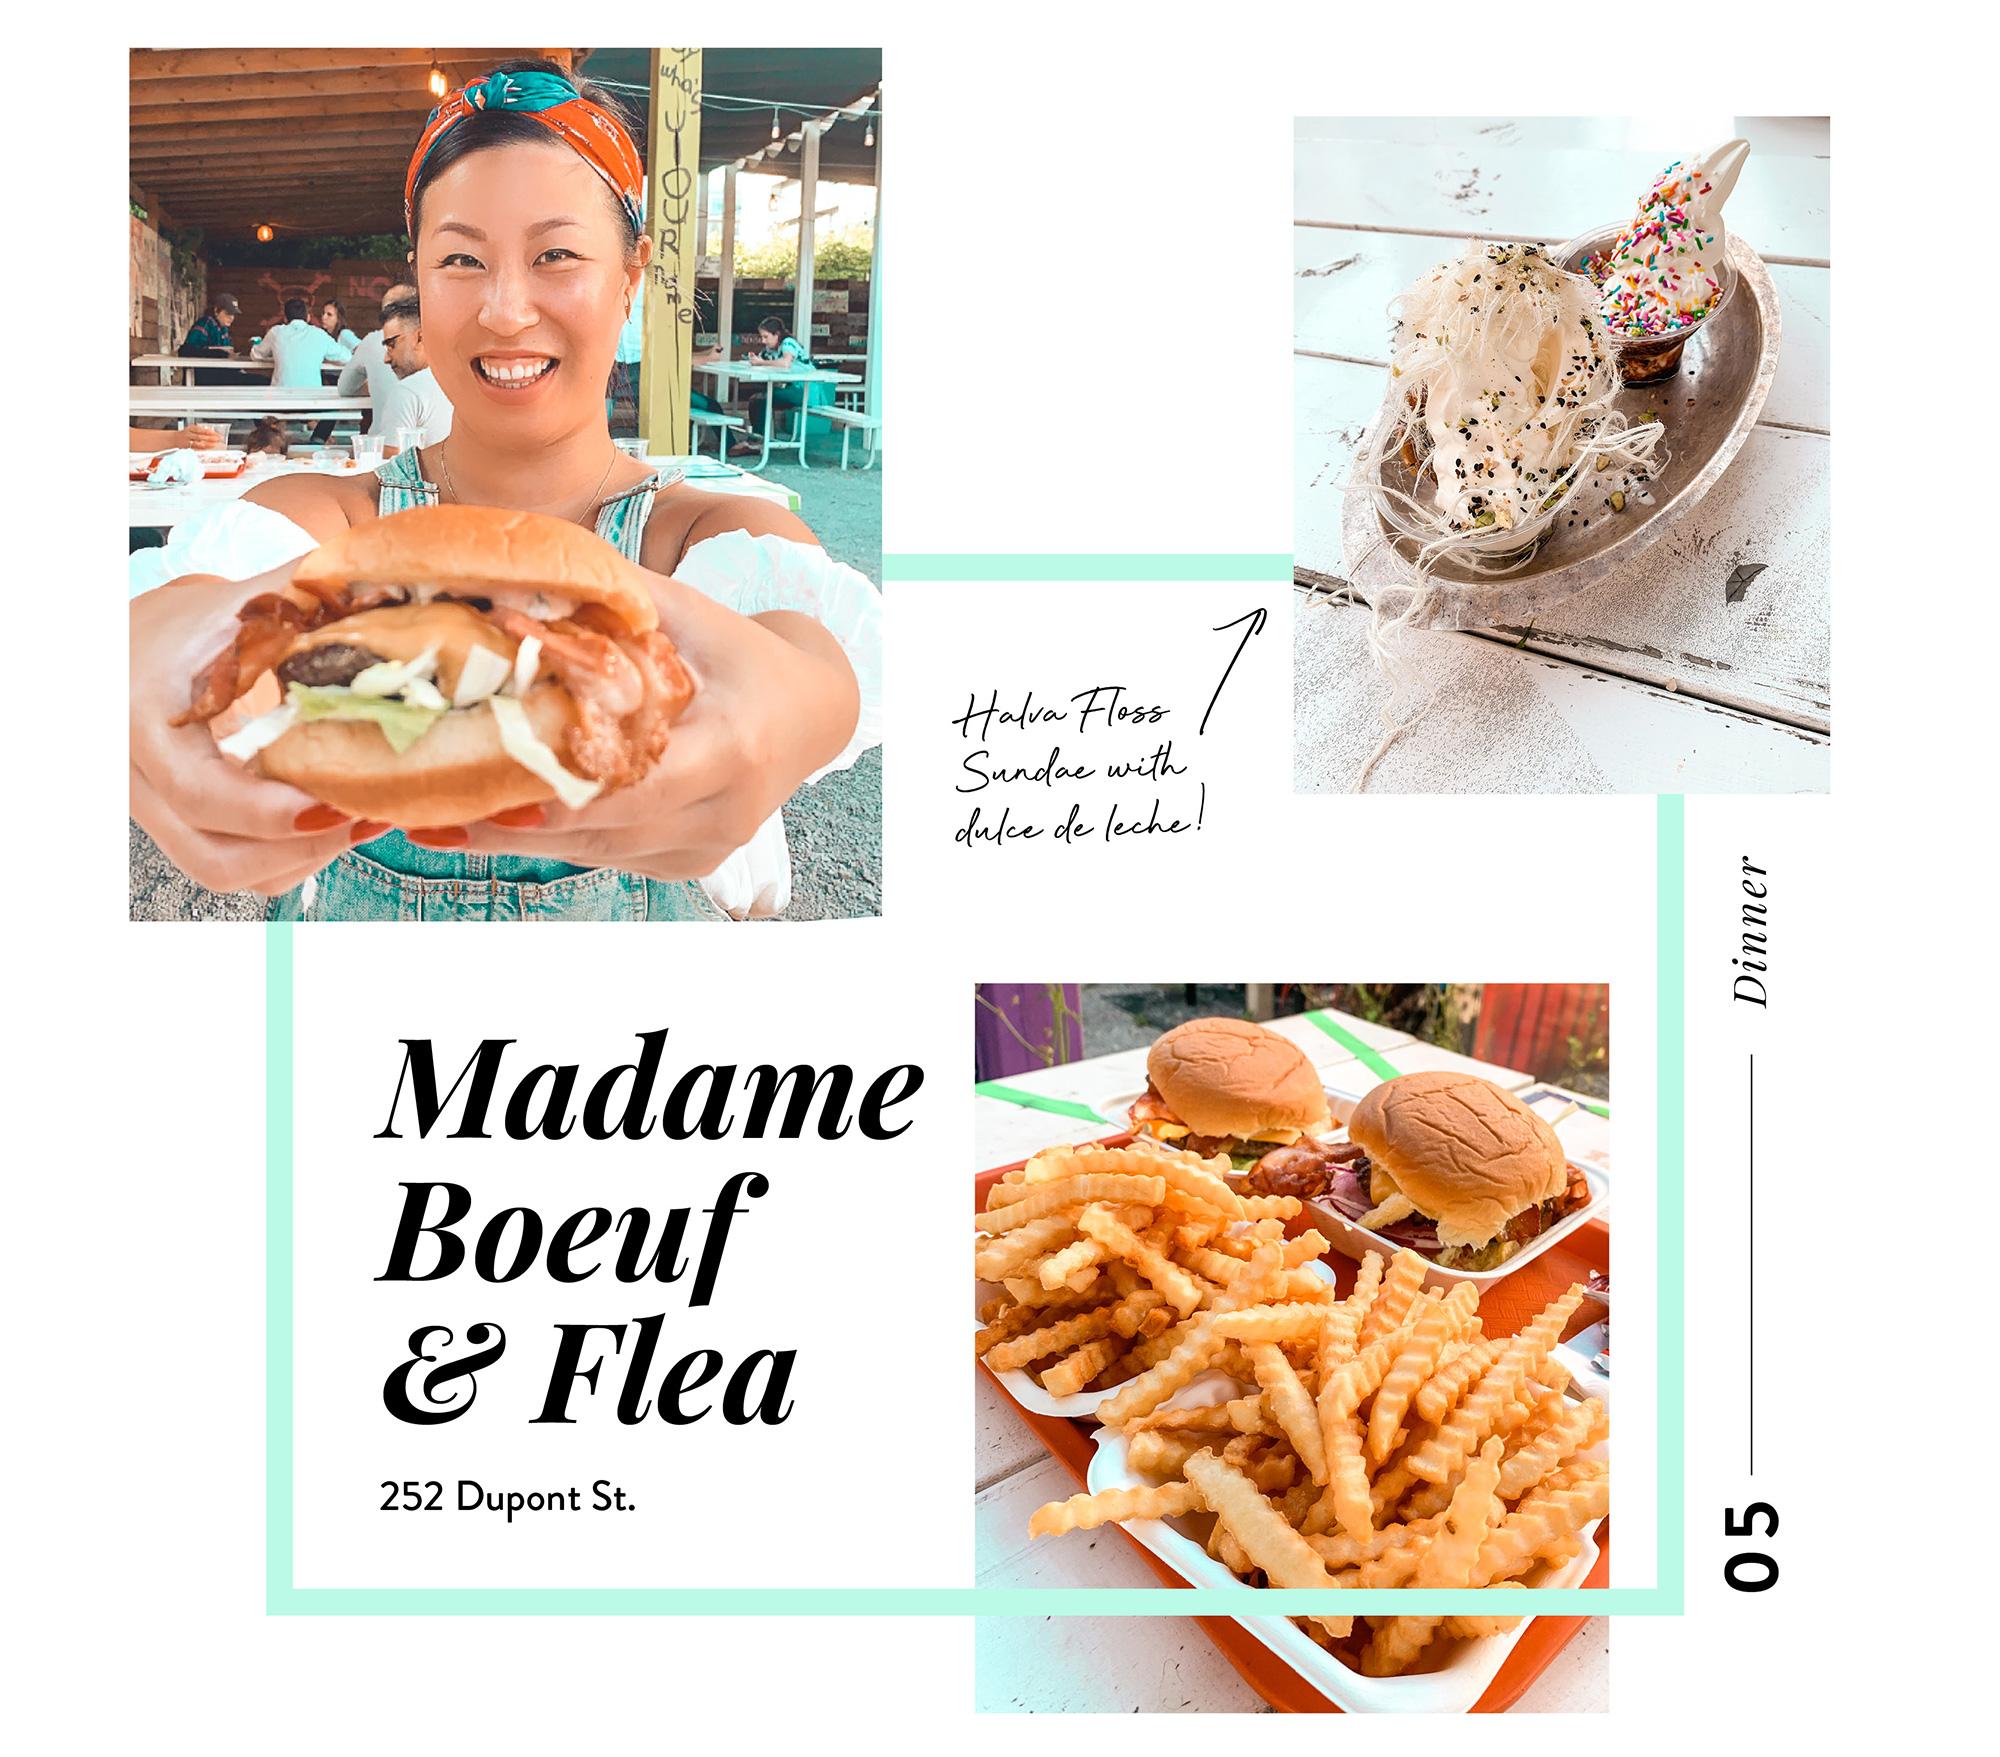 Places to eat in Toronto - madame boeuf + flea